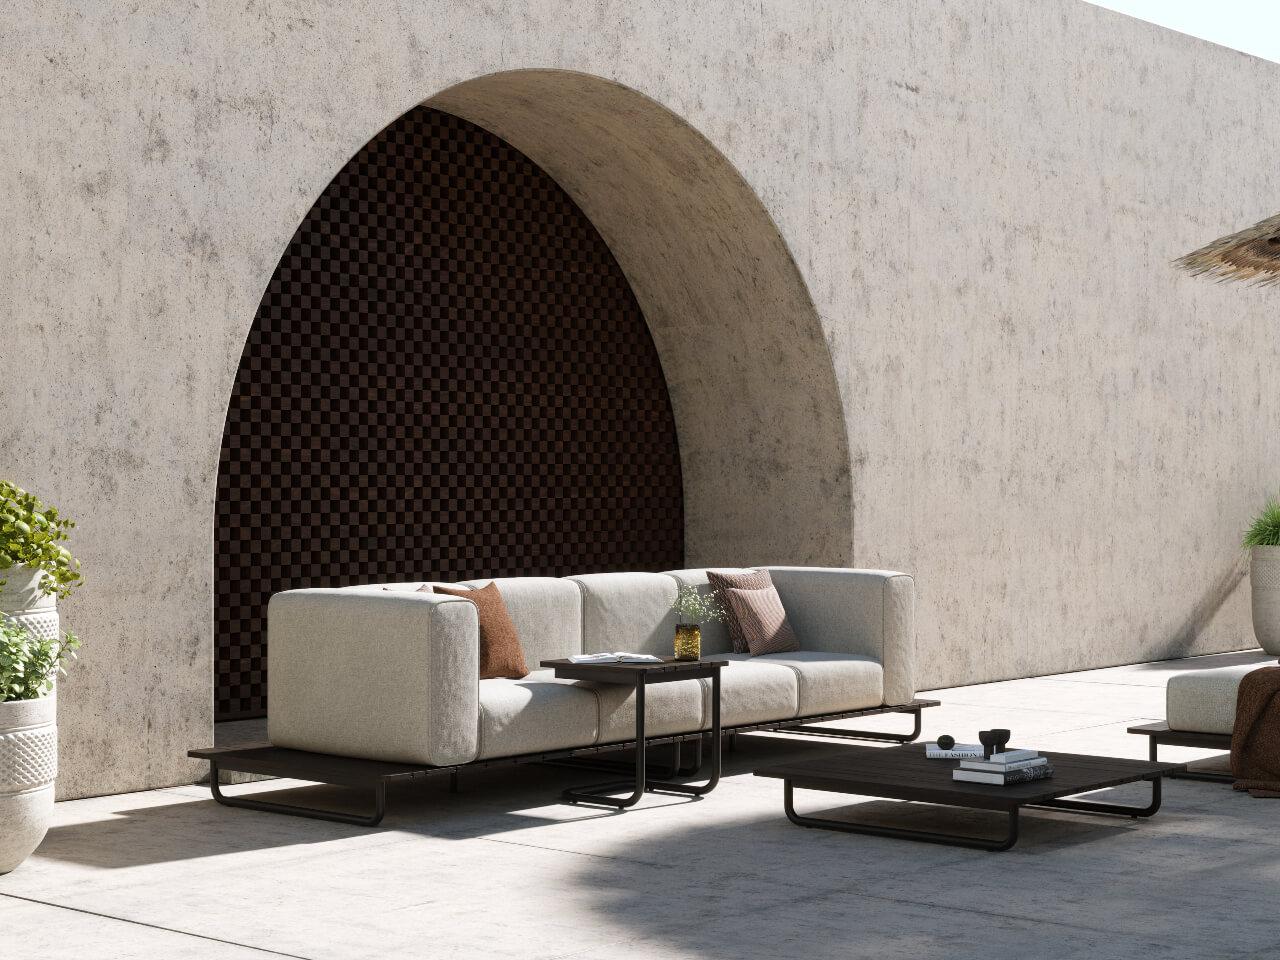 Outdoor-collection-domkapa-summer-interior-design-trends-7